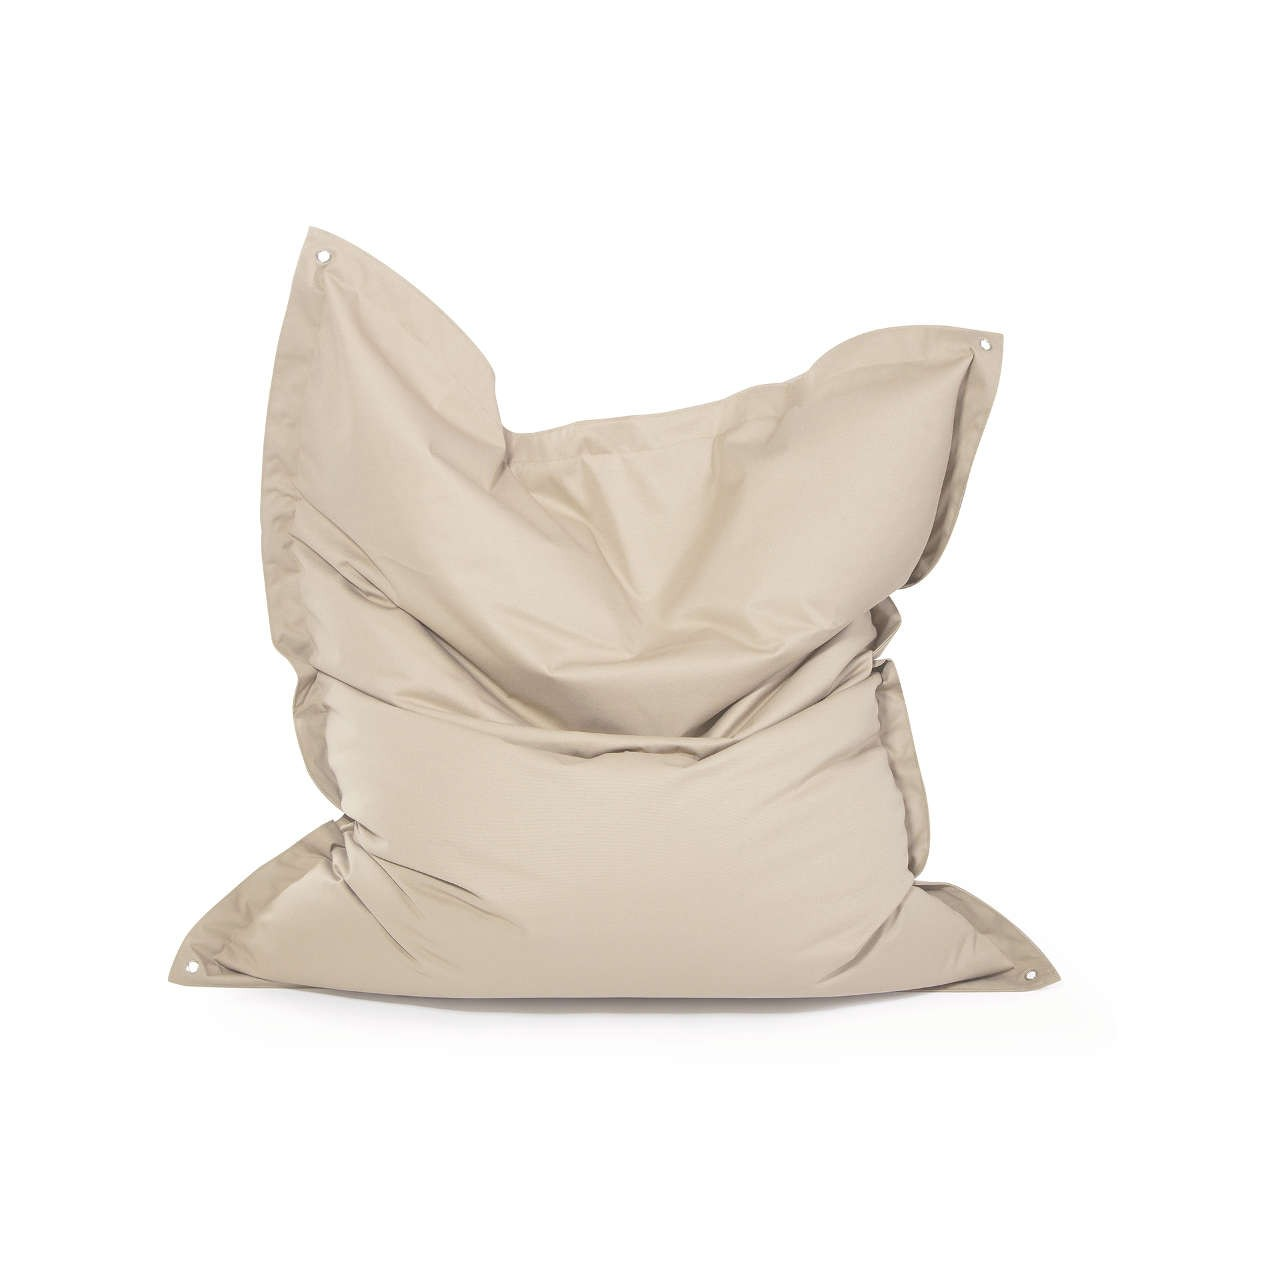 Outbag Sitzkissen Meadow 01MEAPLU-BEI plus beige